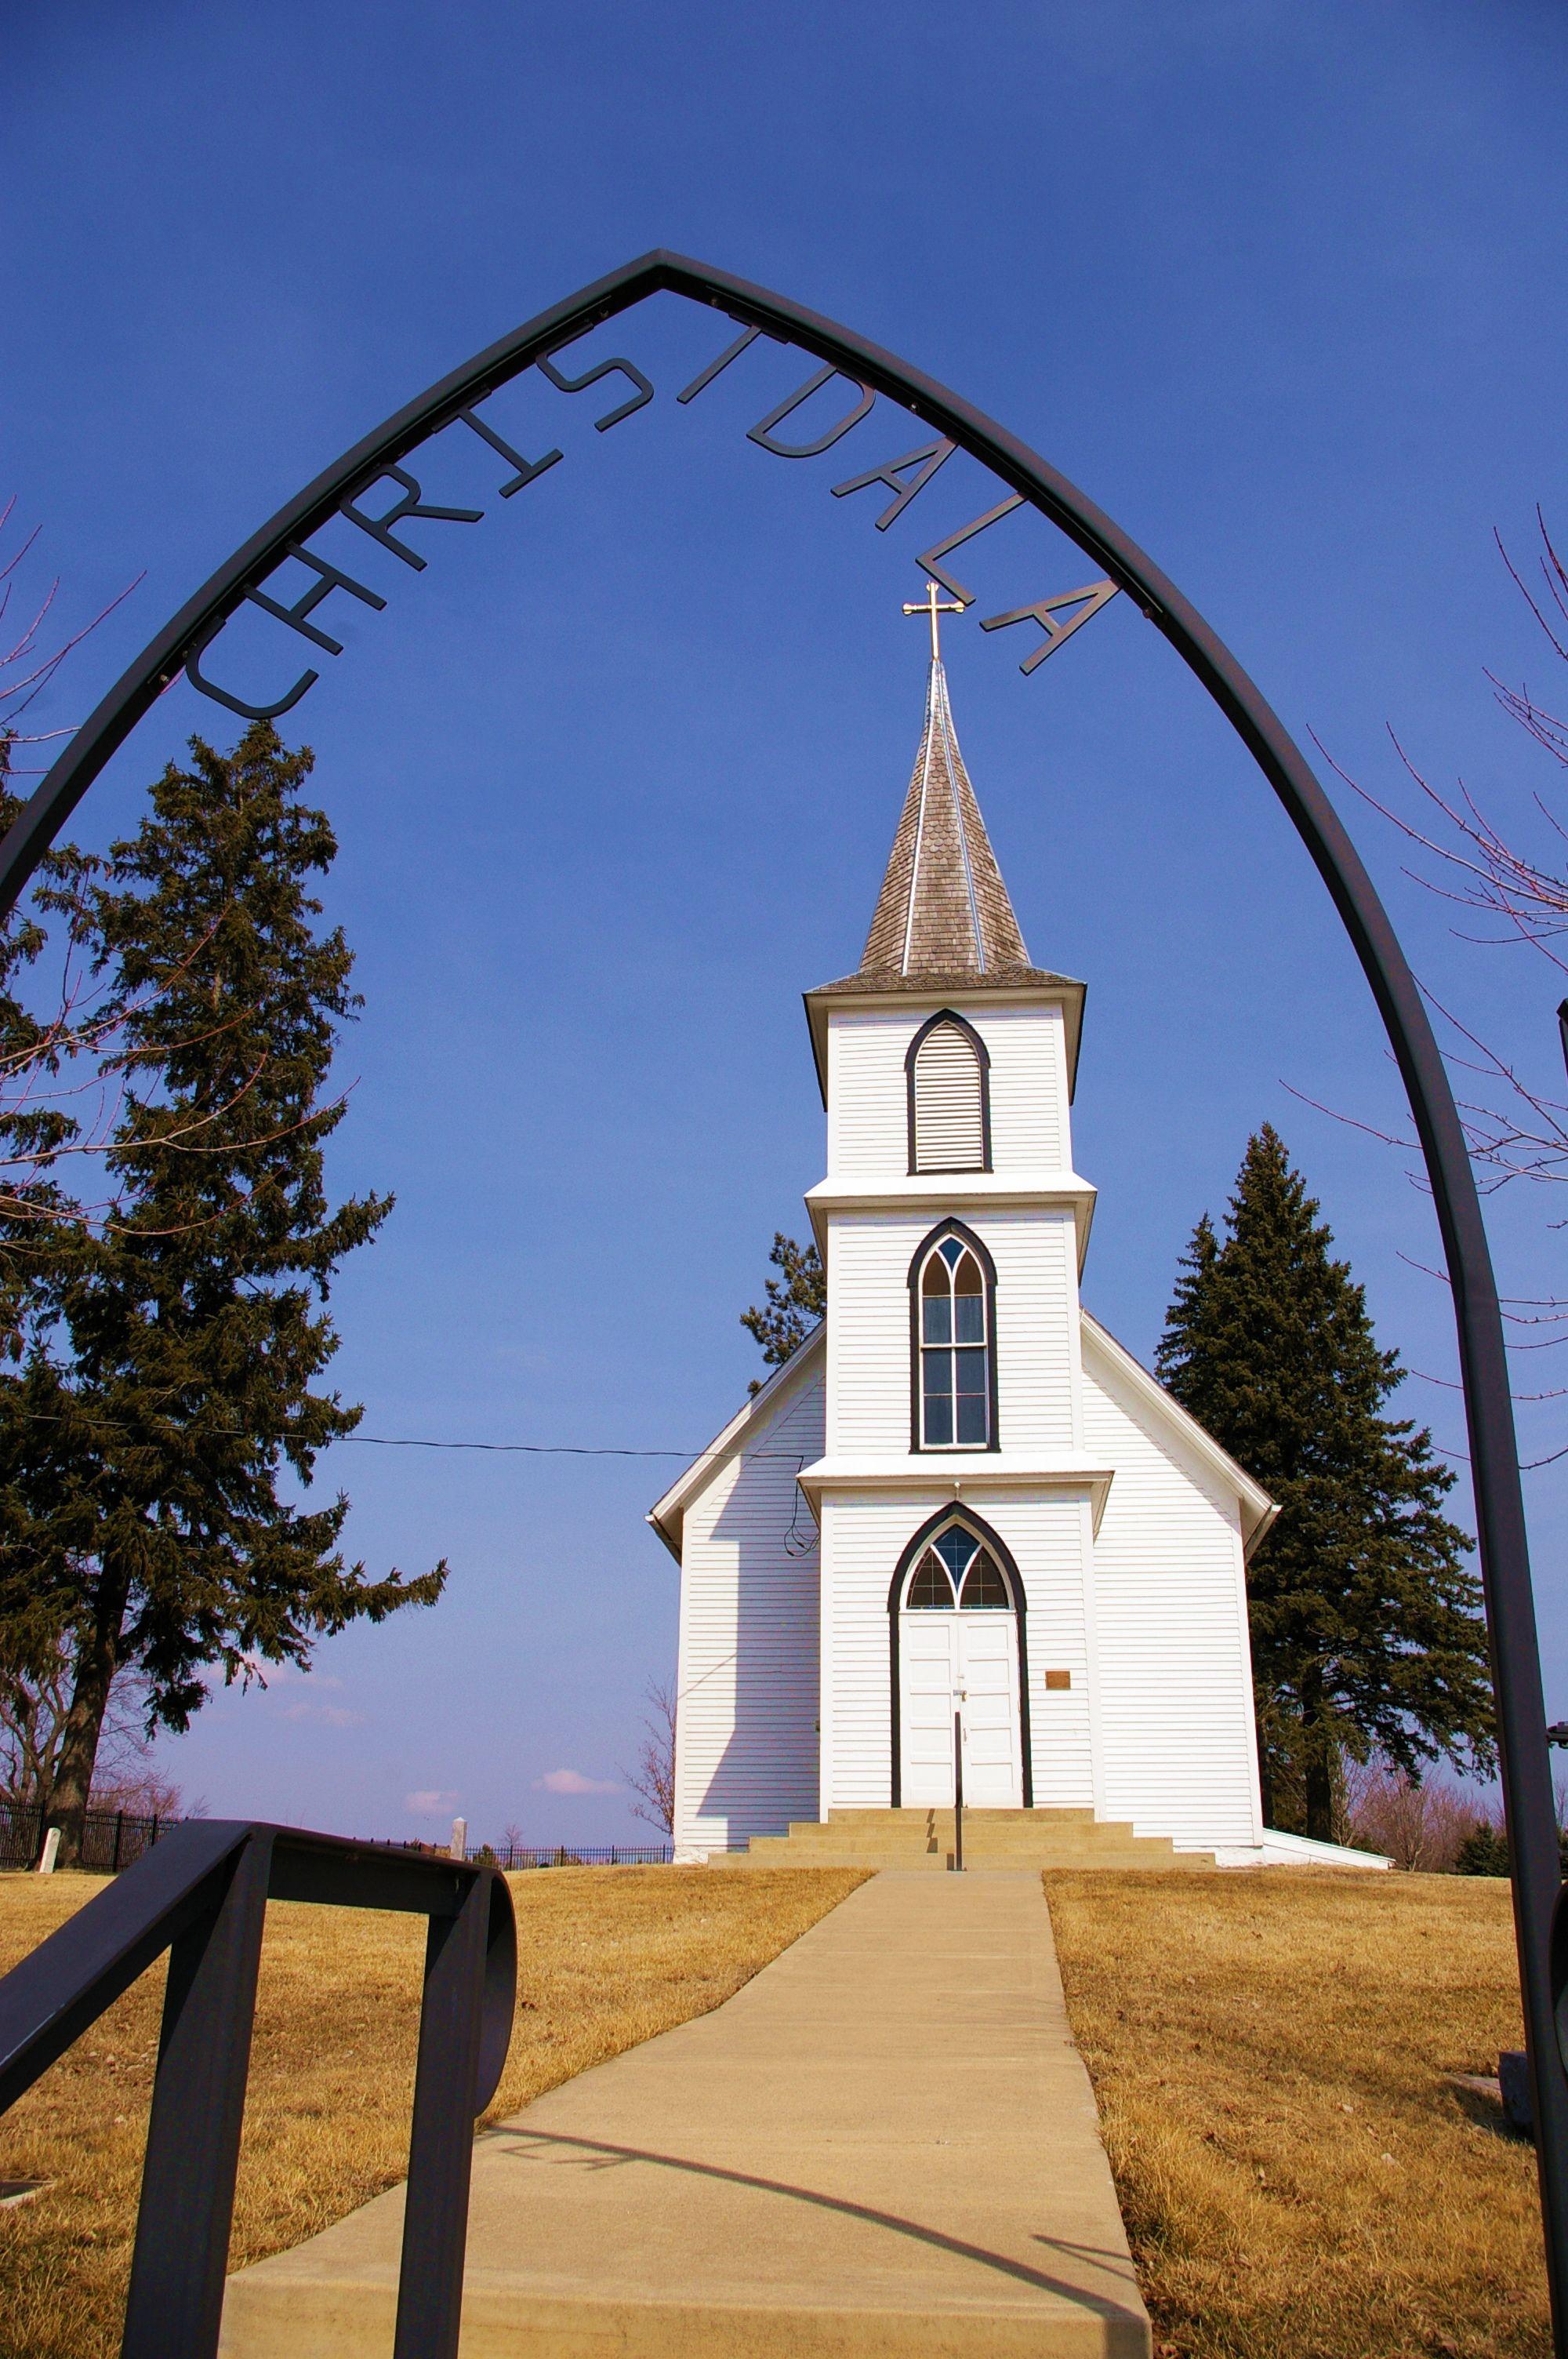 Christdala swedish lutheran church in rice county minnesota near millersburg it was built in